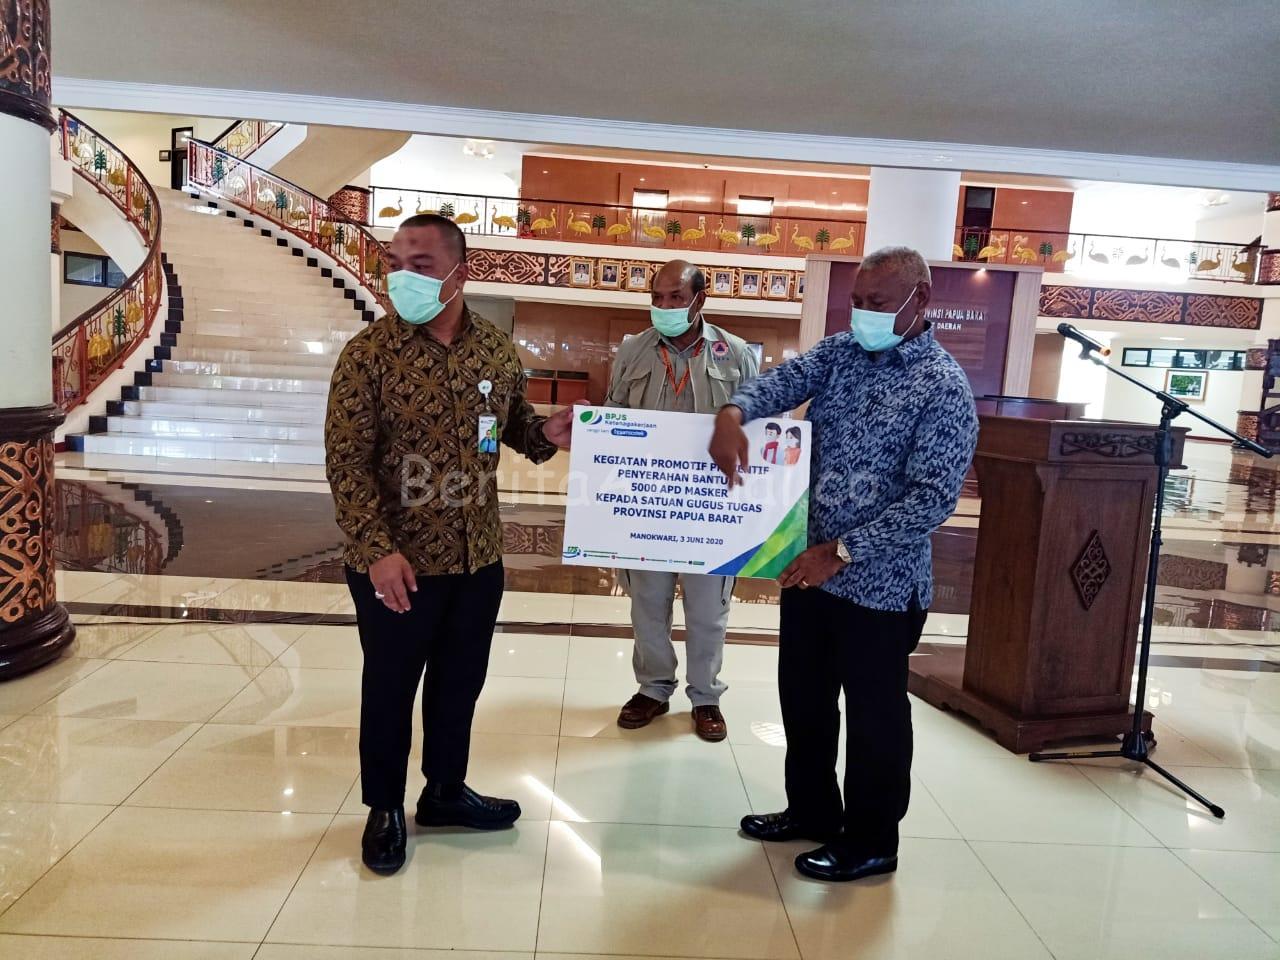 Gubernur Papua Barat Terima Bantuan 5000 Masker Dari BPJS Ketenagakerjaan 7 IMG 20200604 WA0056